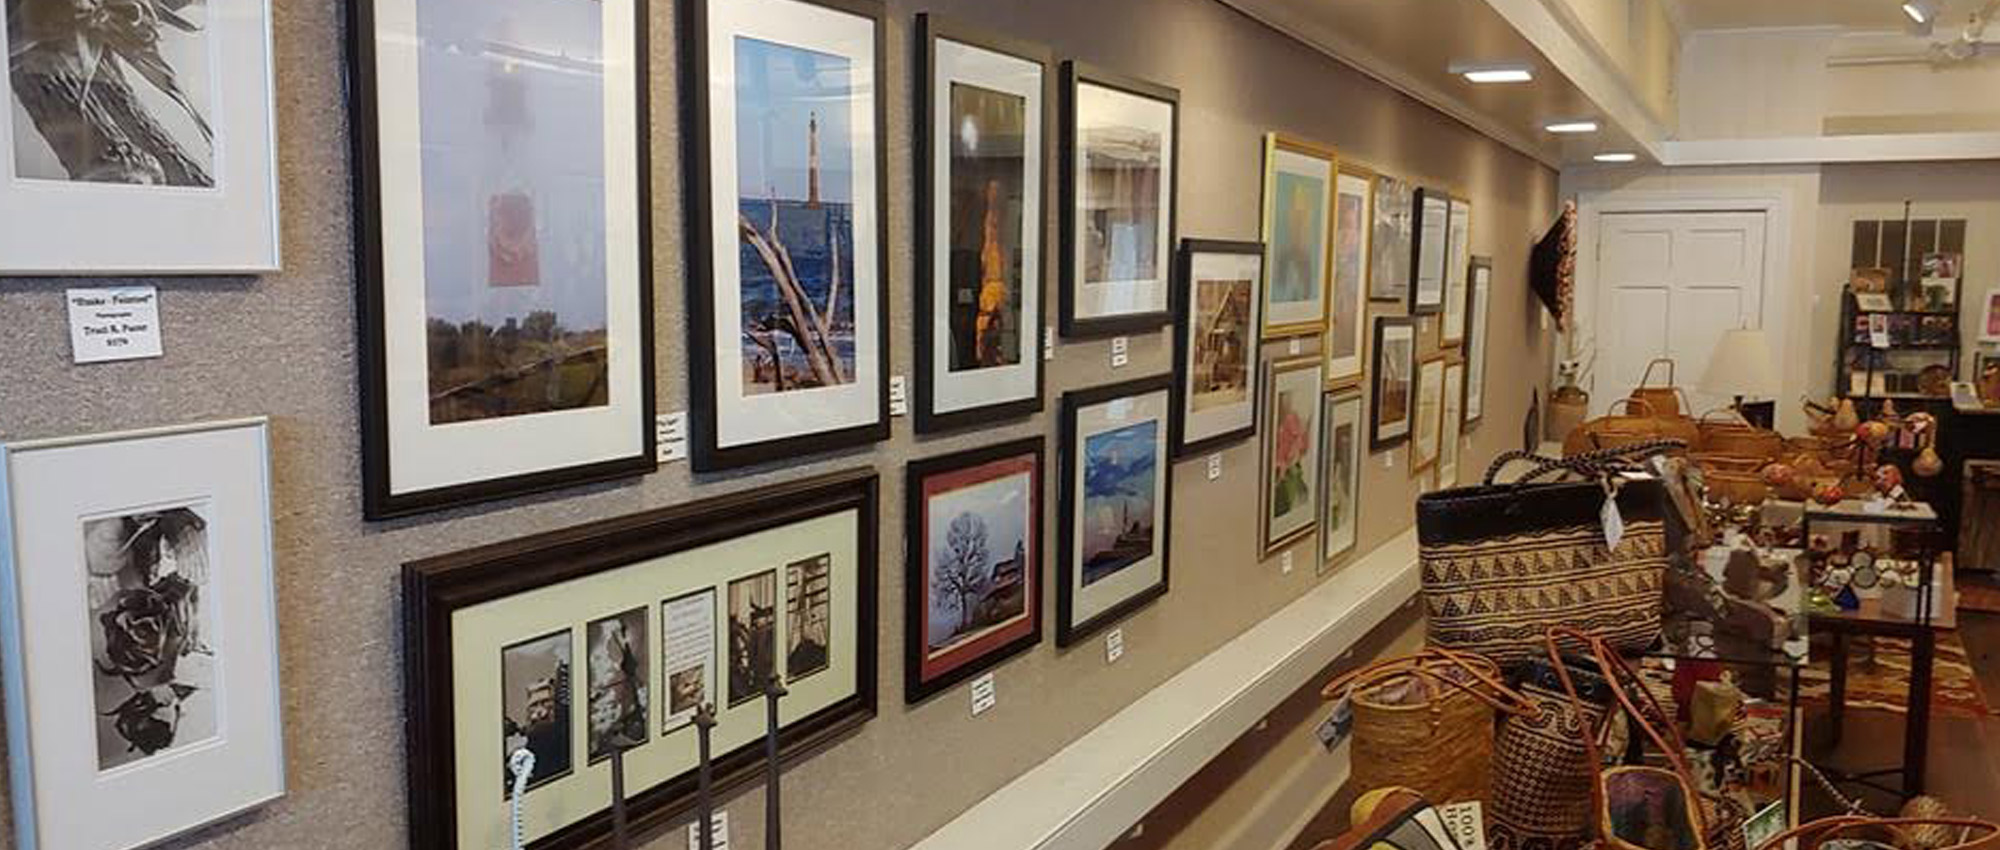 Rice Museum Prevost Gallery